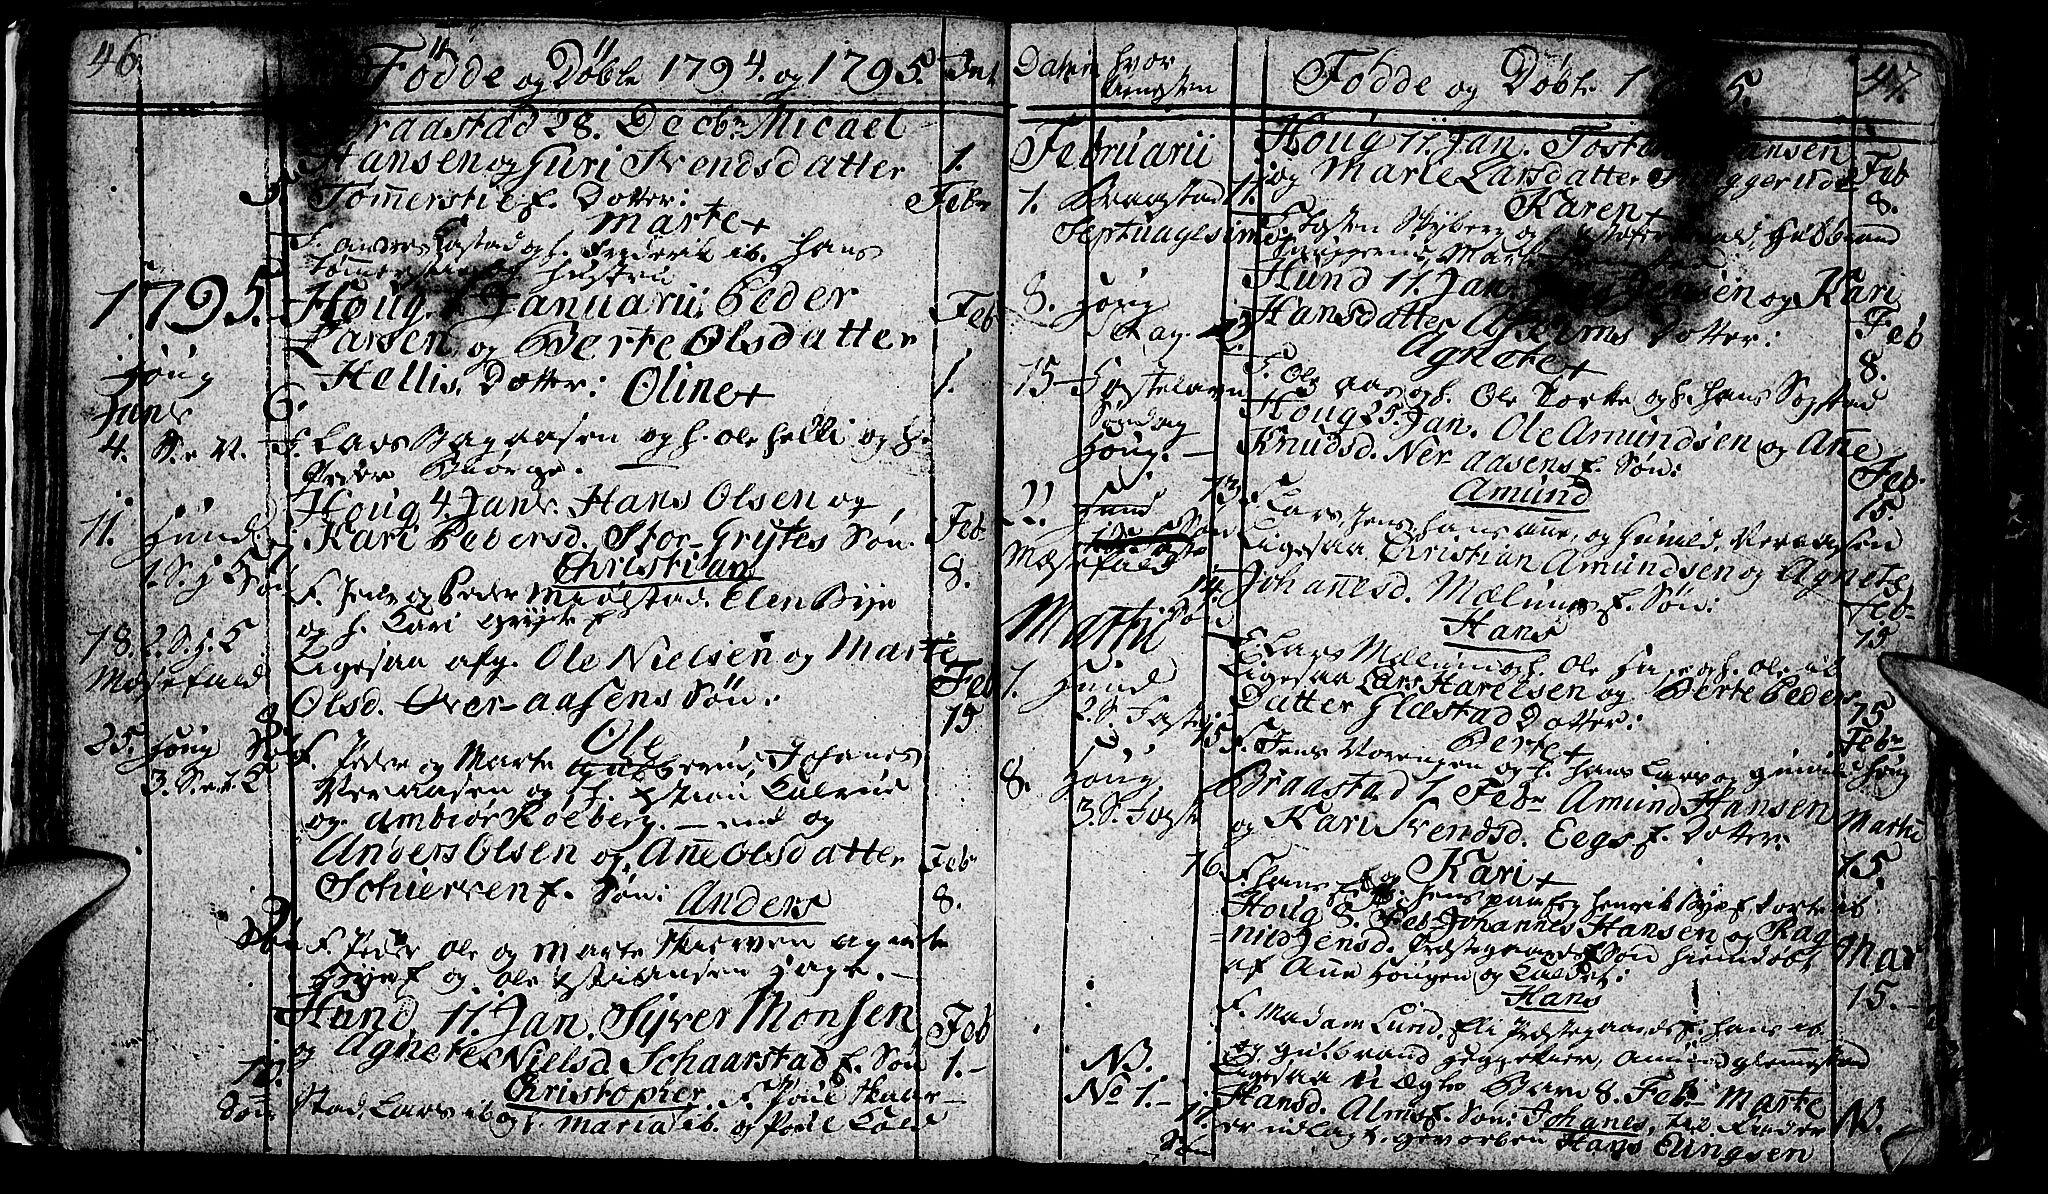 SAH, Vardal prestekontor, H/Ha/Hab/L0002: Klokkerbok nr. 2, 1790-1803, s. 46-47